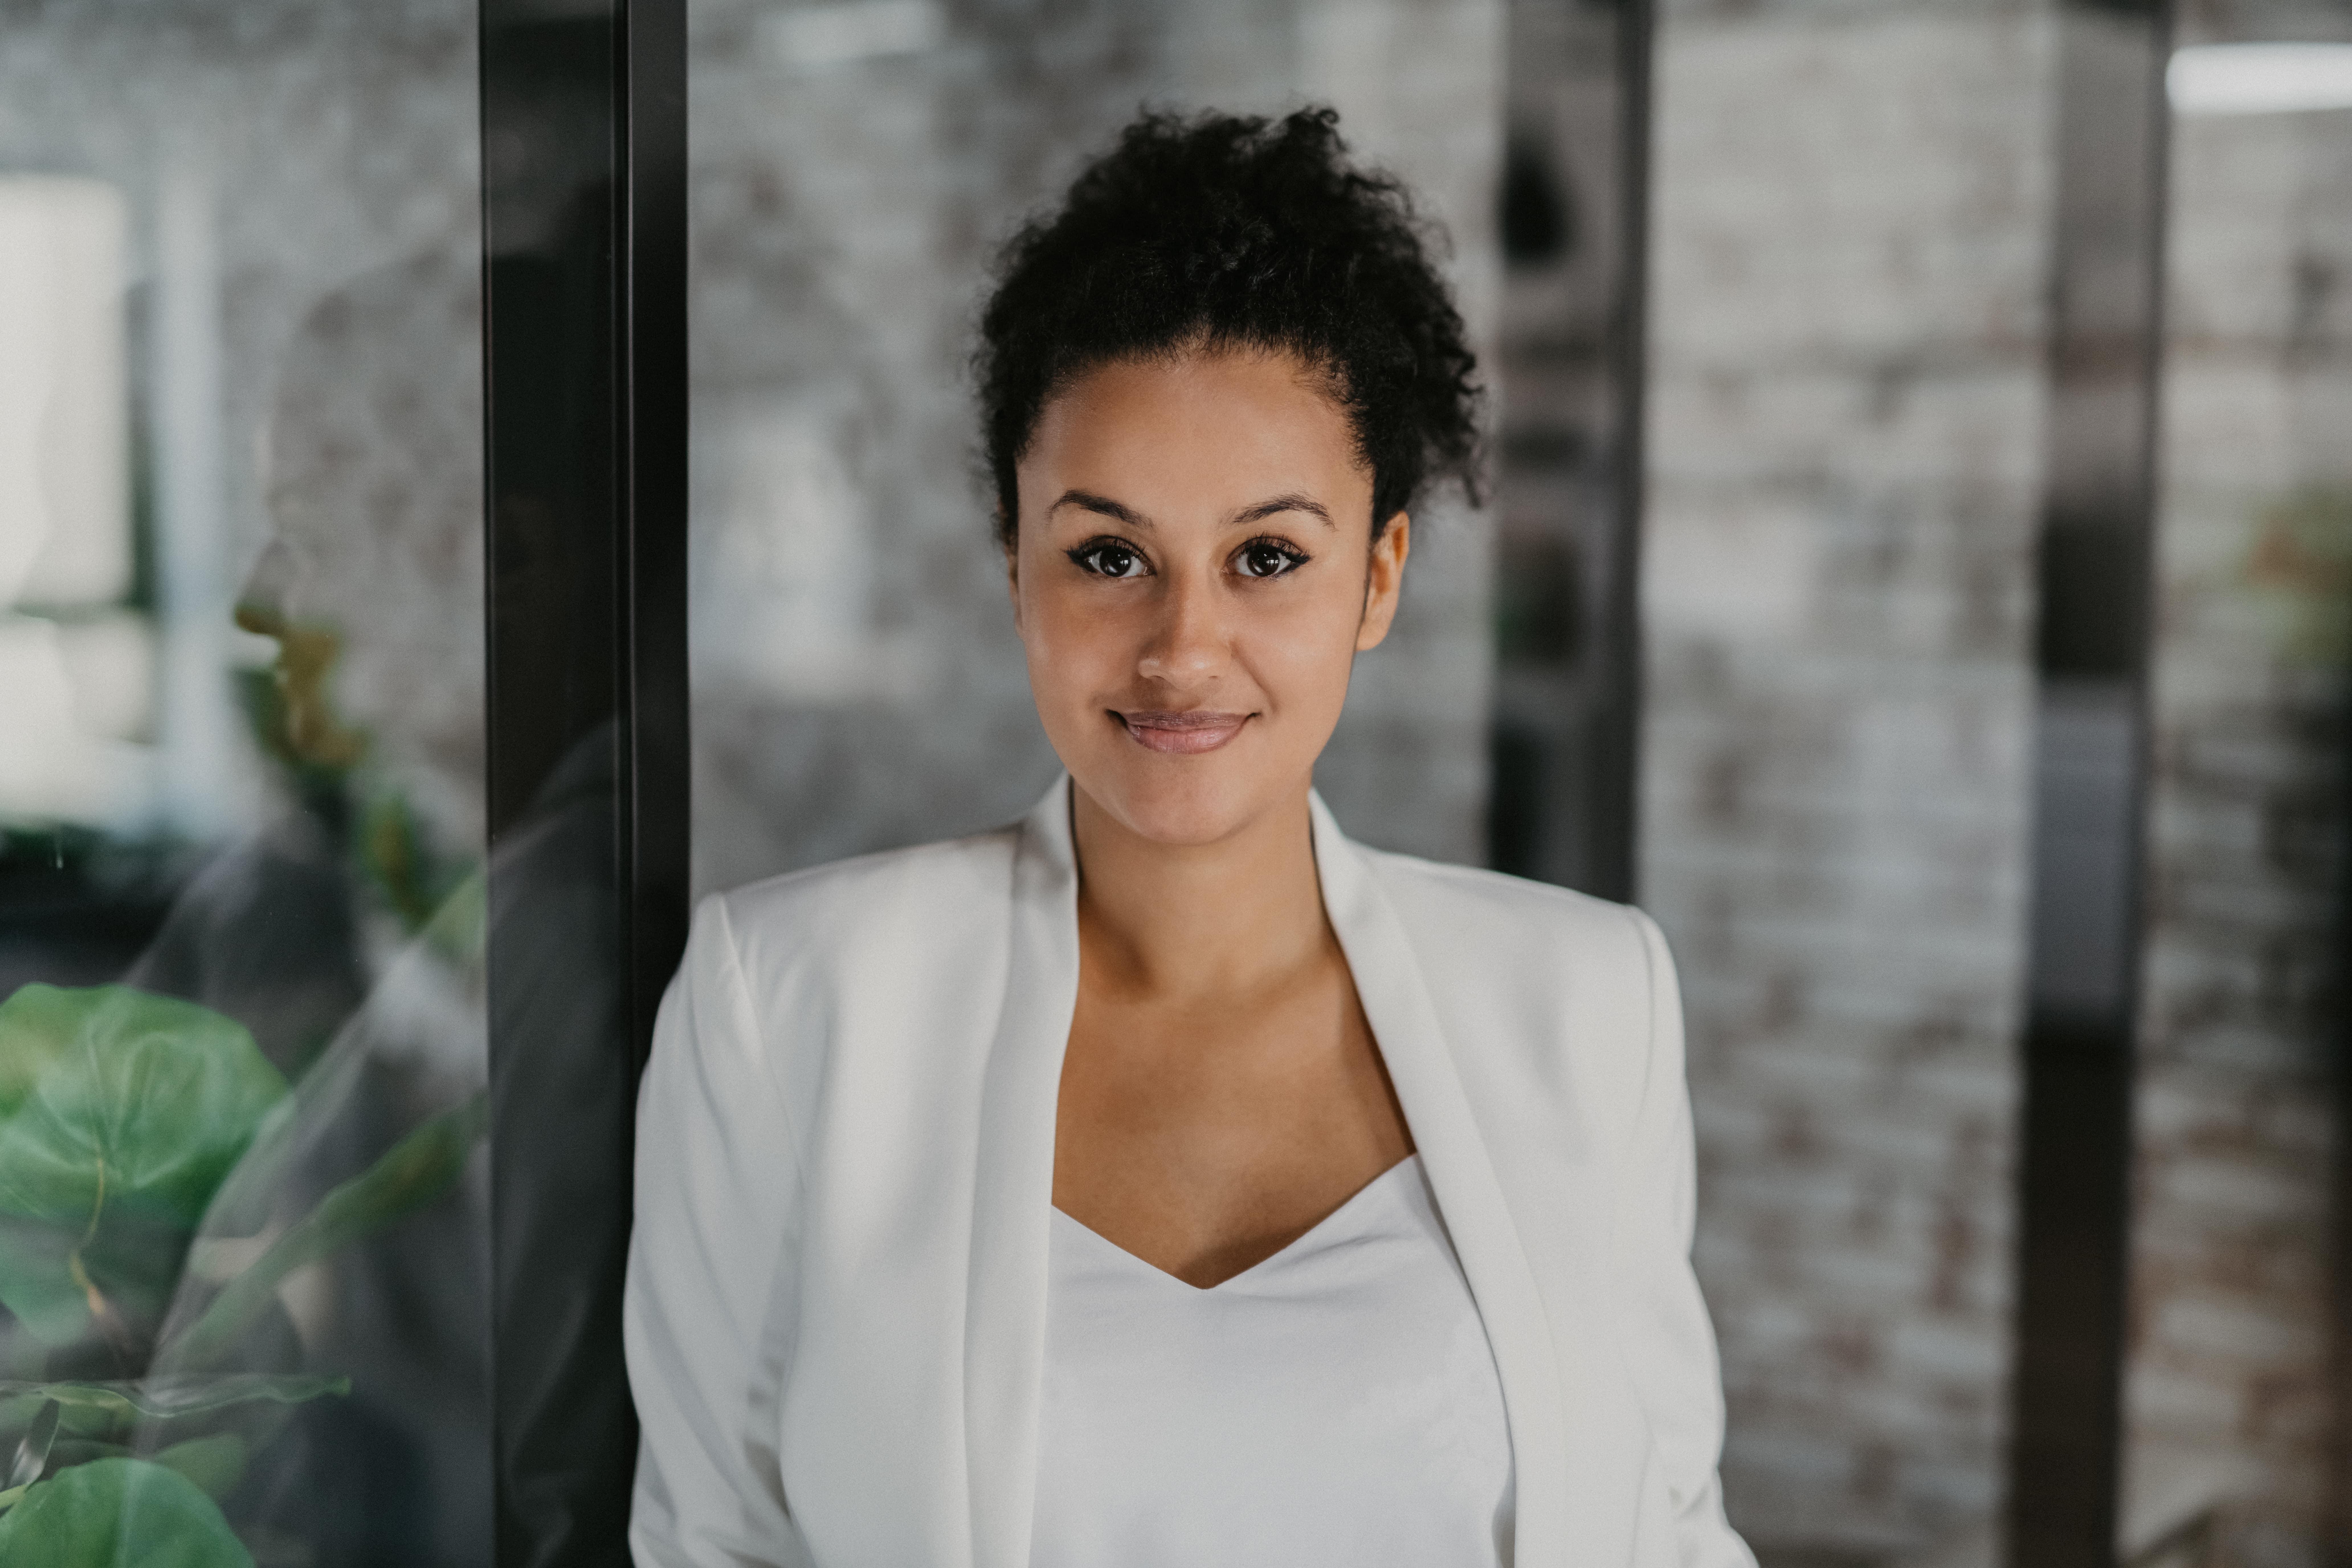 Karin Fuentová, Ceo Digitoo V Rozhovoru Pro Coworkingové Centrum Worklounge